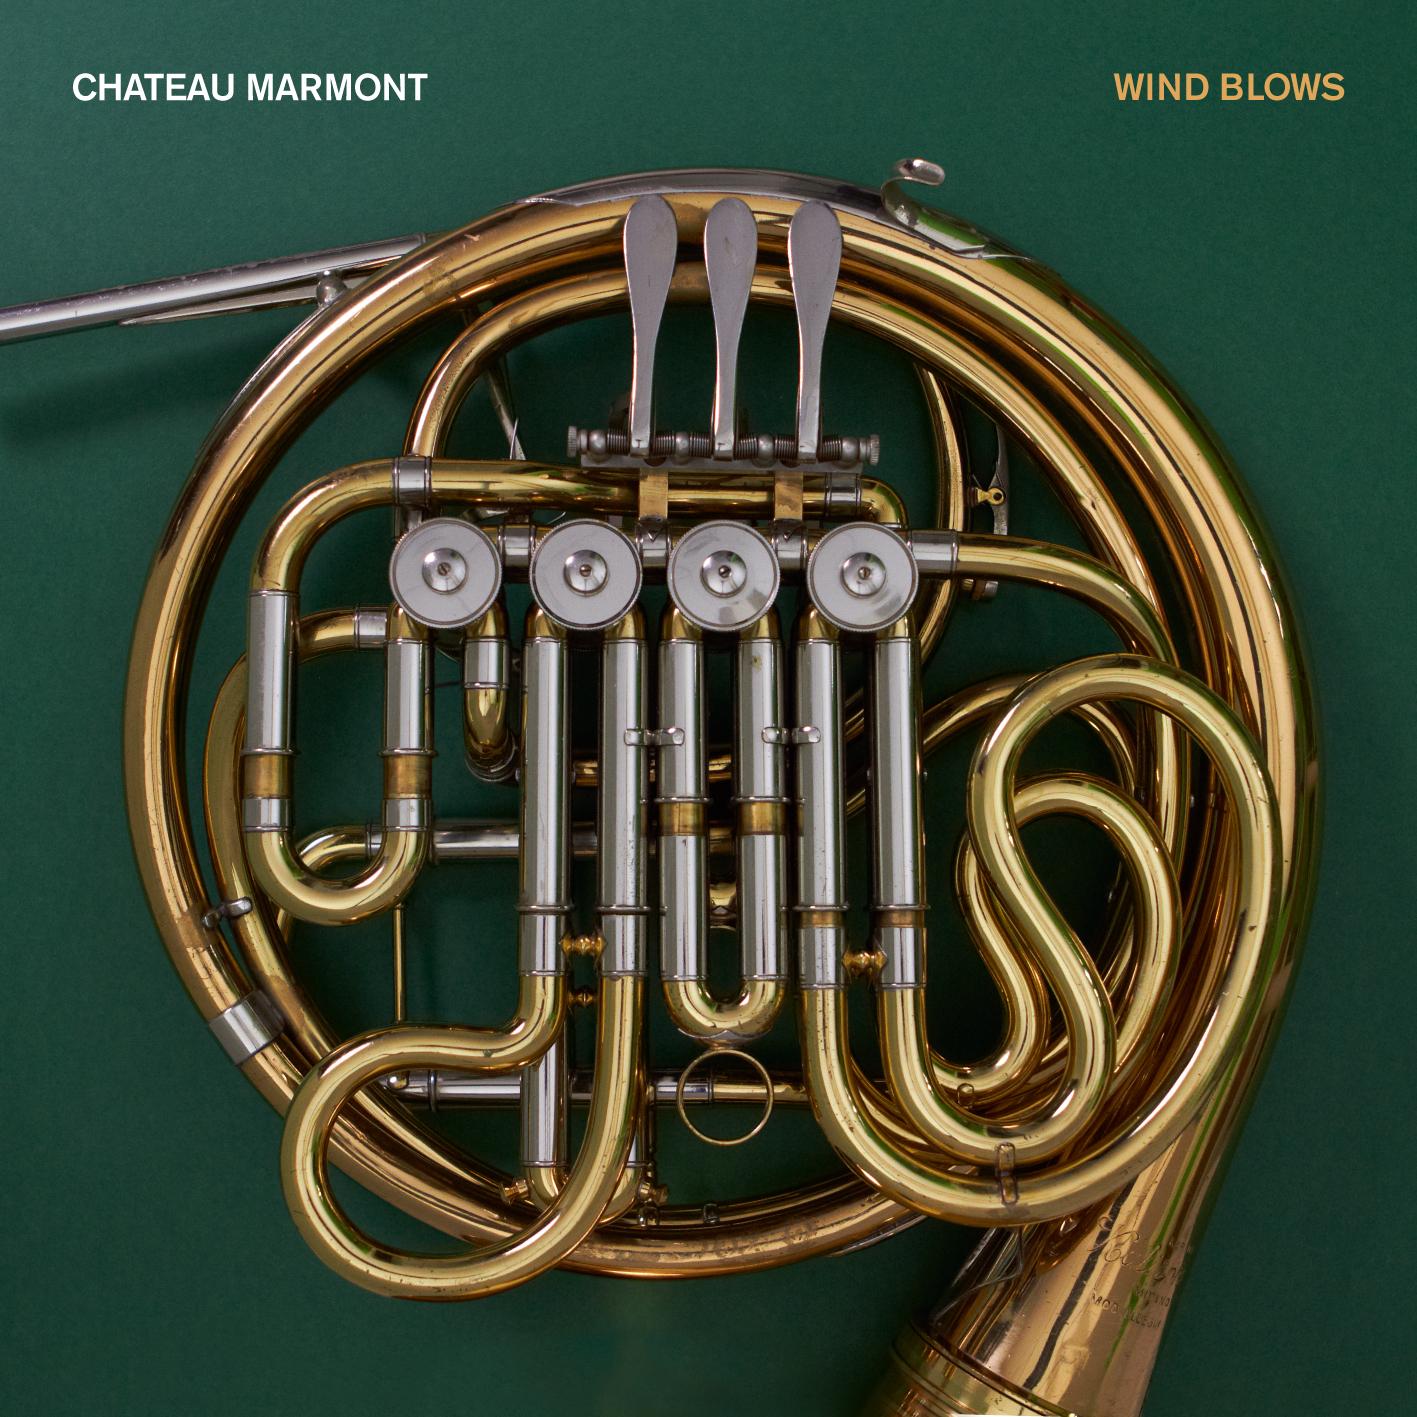 I Need You (Chateau Marmont remix)